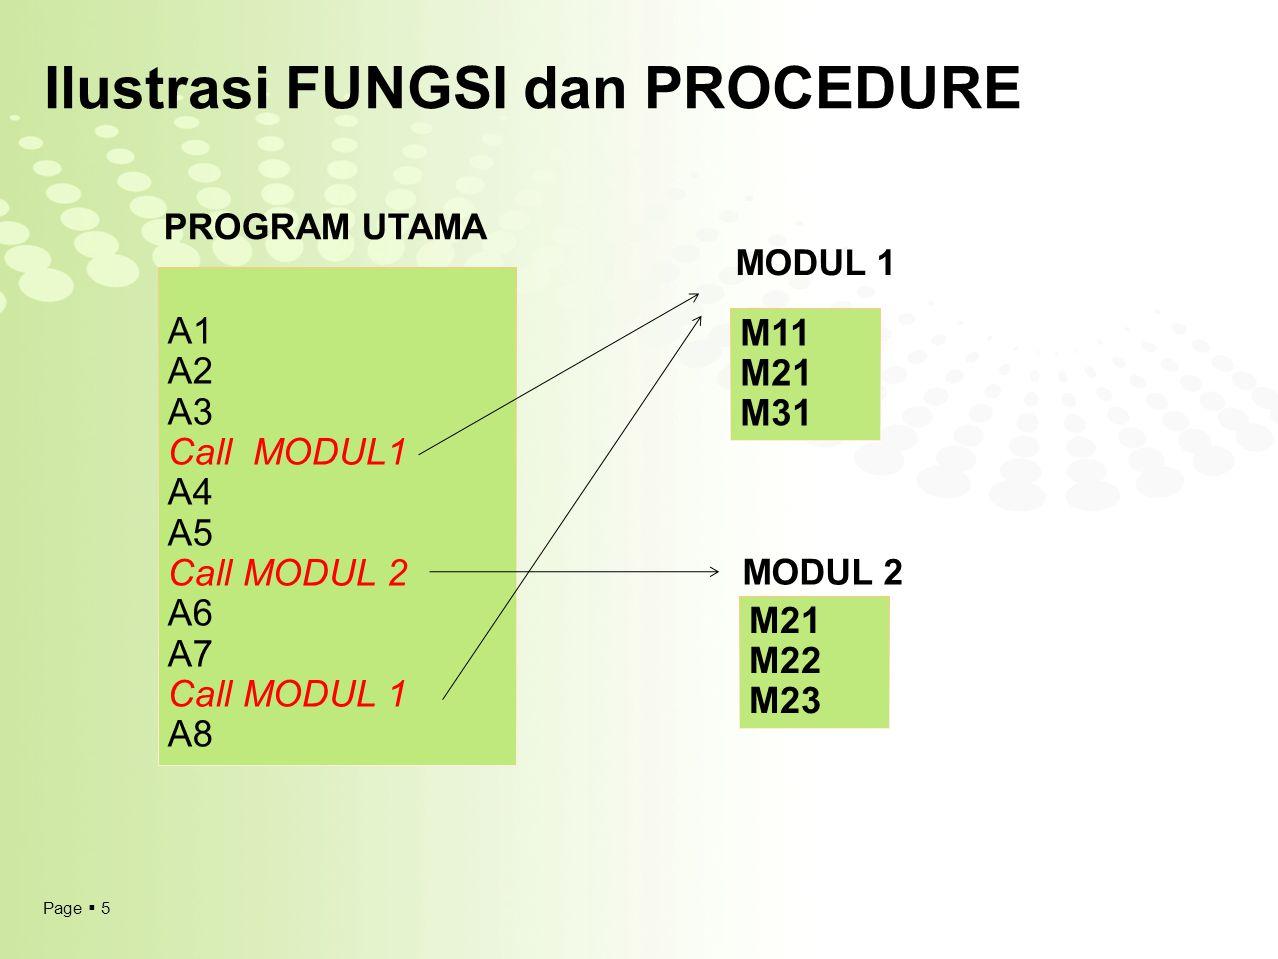 Page  5 Ilustrasi FUNGSI dan PROCEDURE A1 A2 A3 Call MODUL1 A4 A5 Call MODUL 2 A6 A7 Call MODUL 1 A8 M11 M21 M31 M21 M22 M23 PROGRAM UTAMA MODUL 1 MO